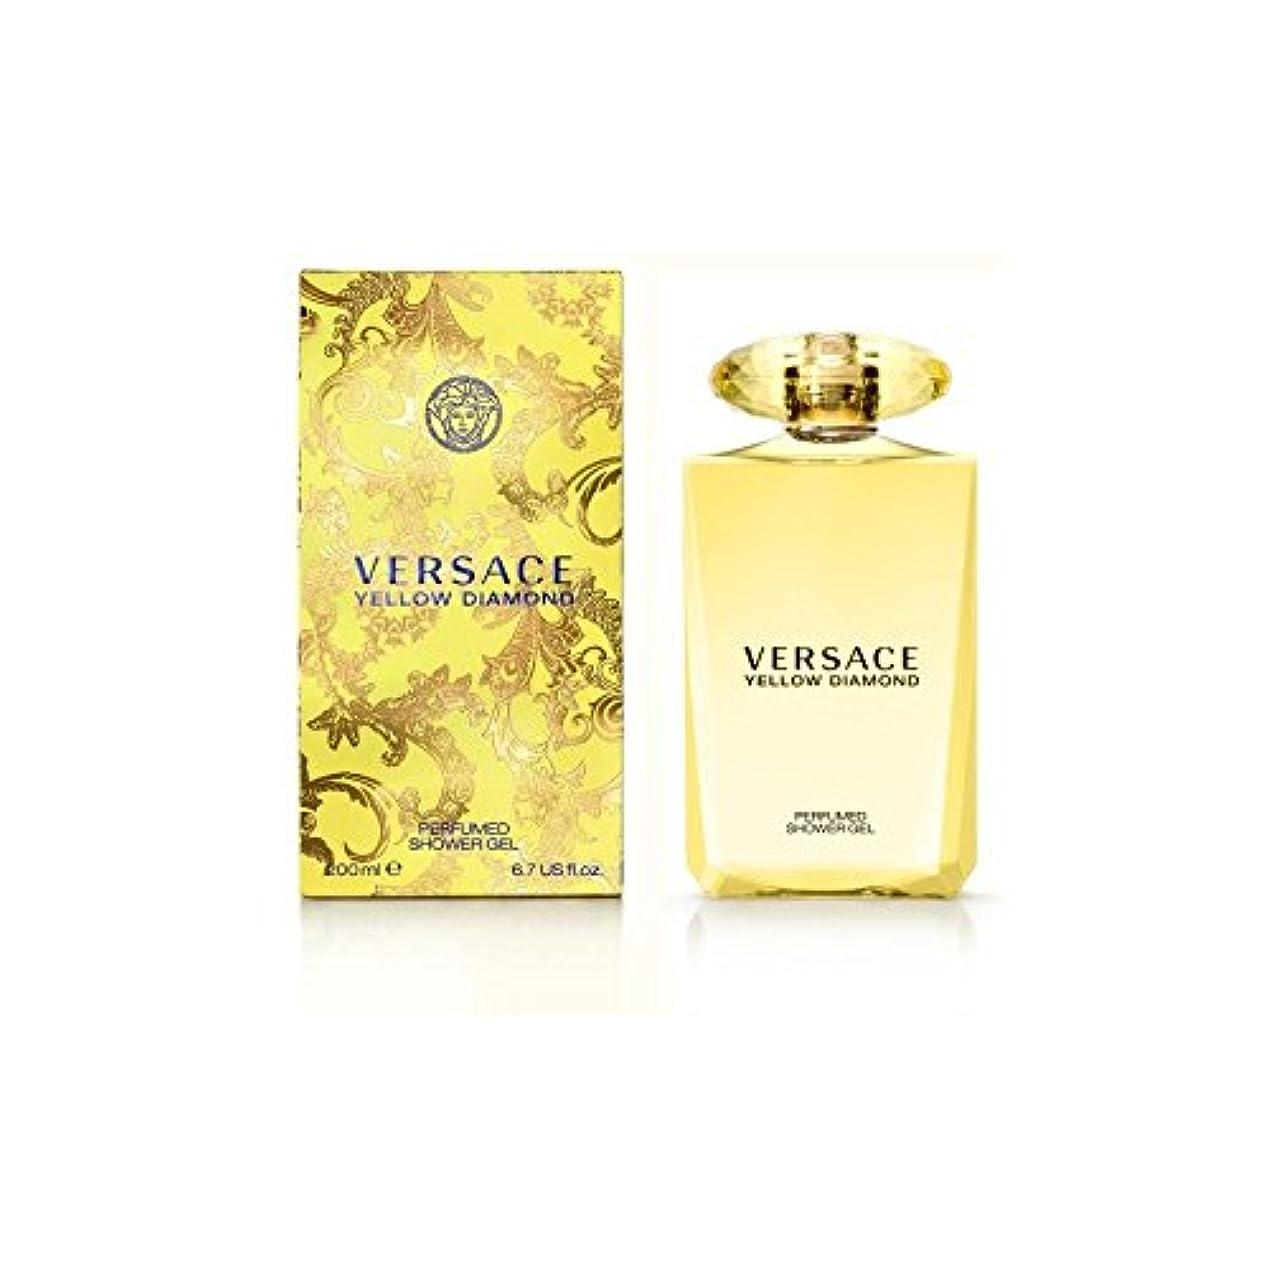 Versace Yellow Diamond Bath & Shower Gel 200ml - ヴェルサーチ黄色のダイヤモンドバス&シャワージェル200 [並行輸入品]